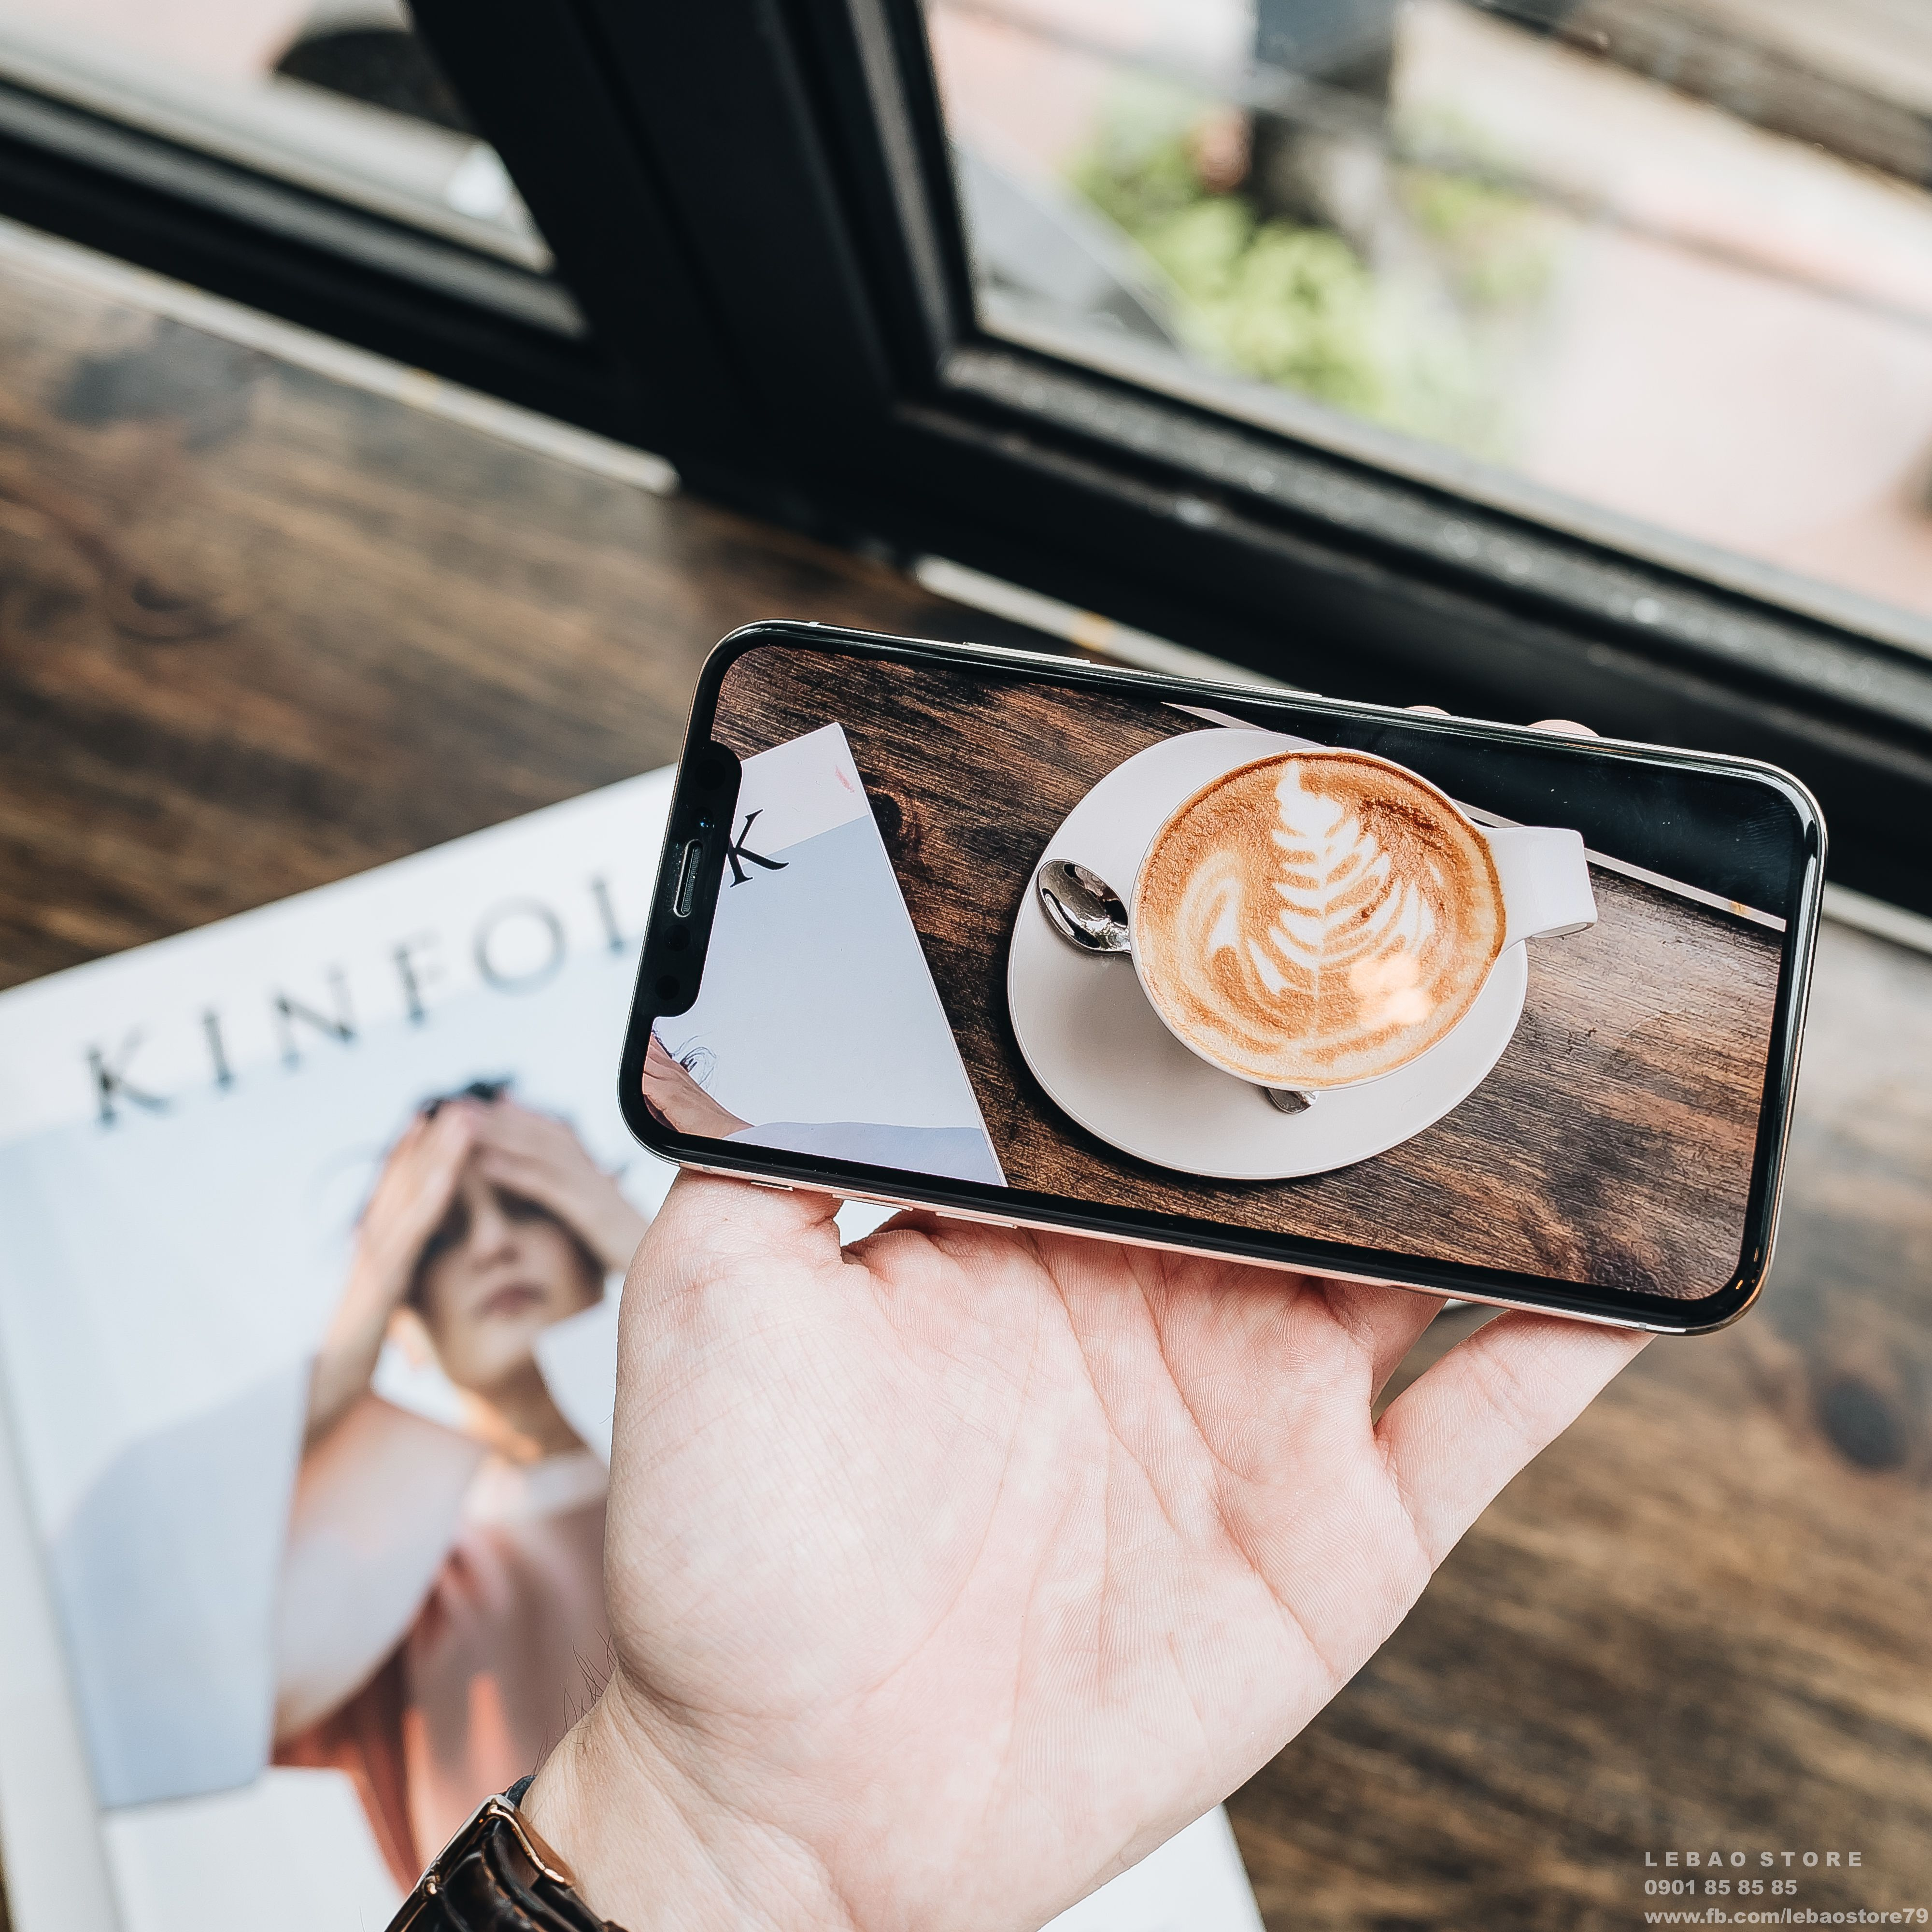 Ý tưởng của Bảo Lê trên iPhone Iphone, Apple iphone, Macbook